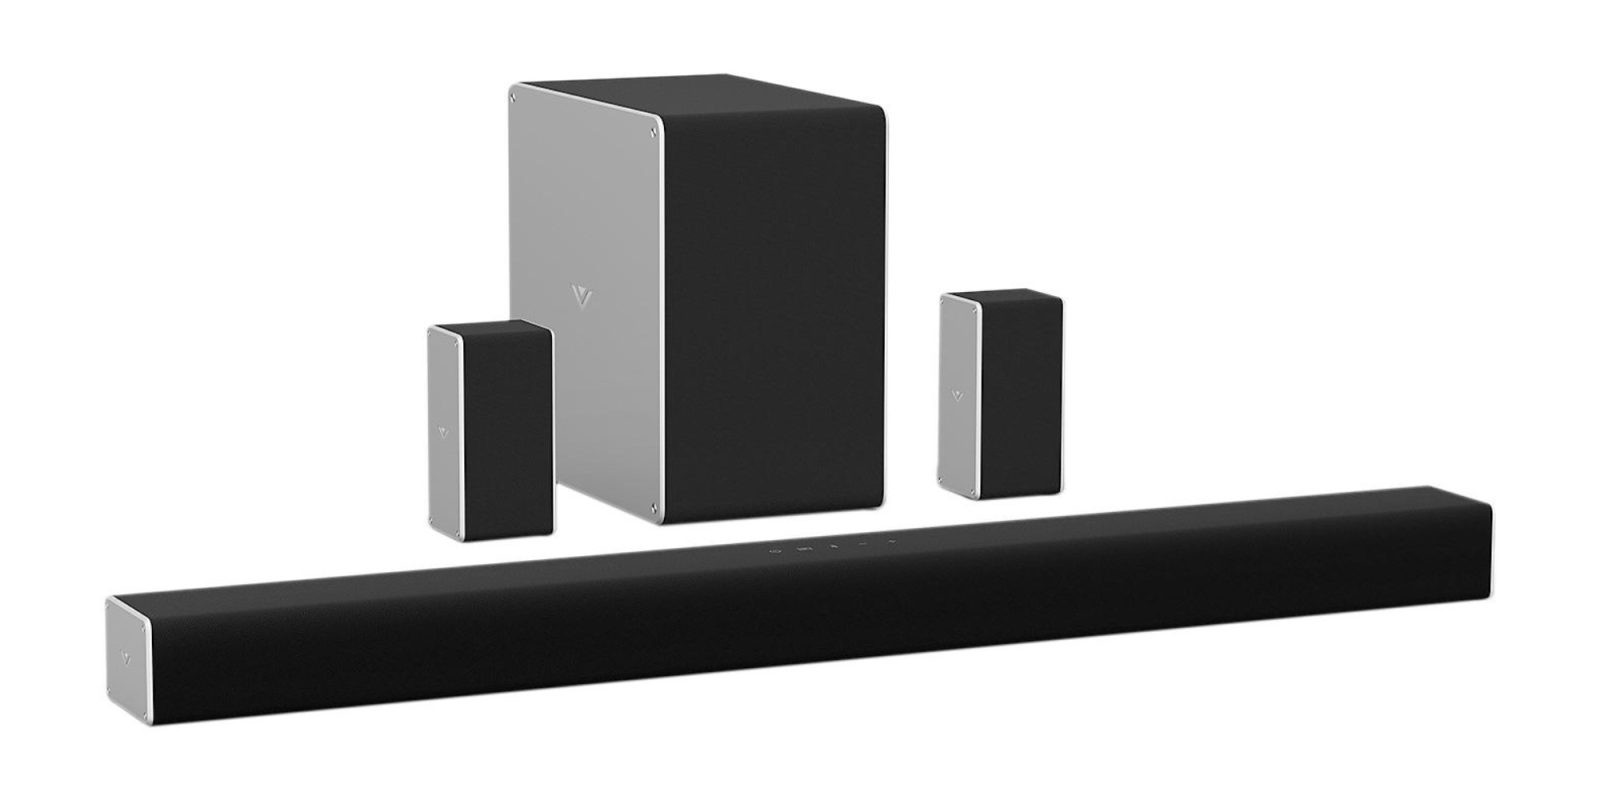 VIZIO's 36-inch Dolby Atmos Soundbar System drops to $230 (Refurb, Orig. $500)